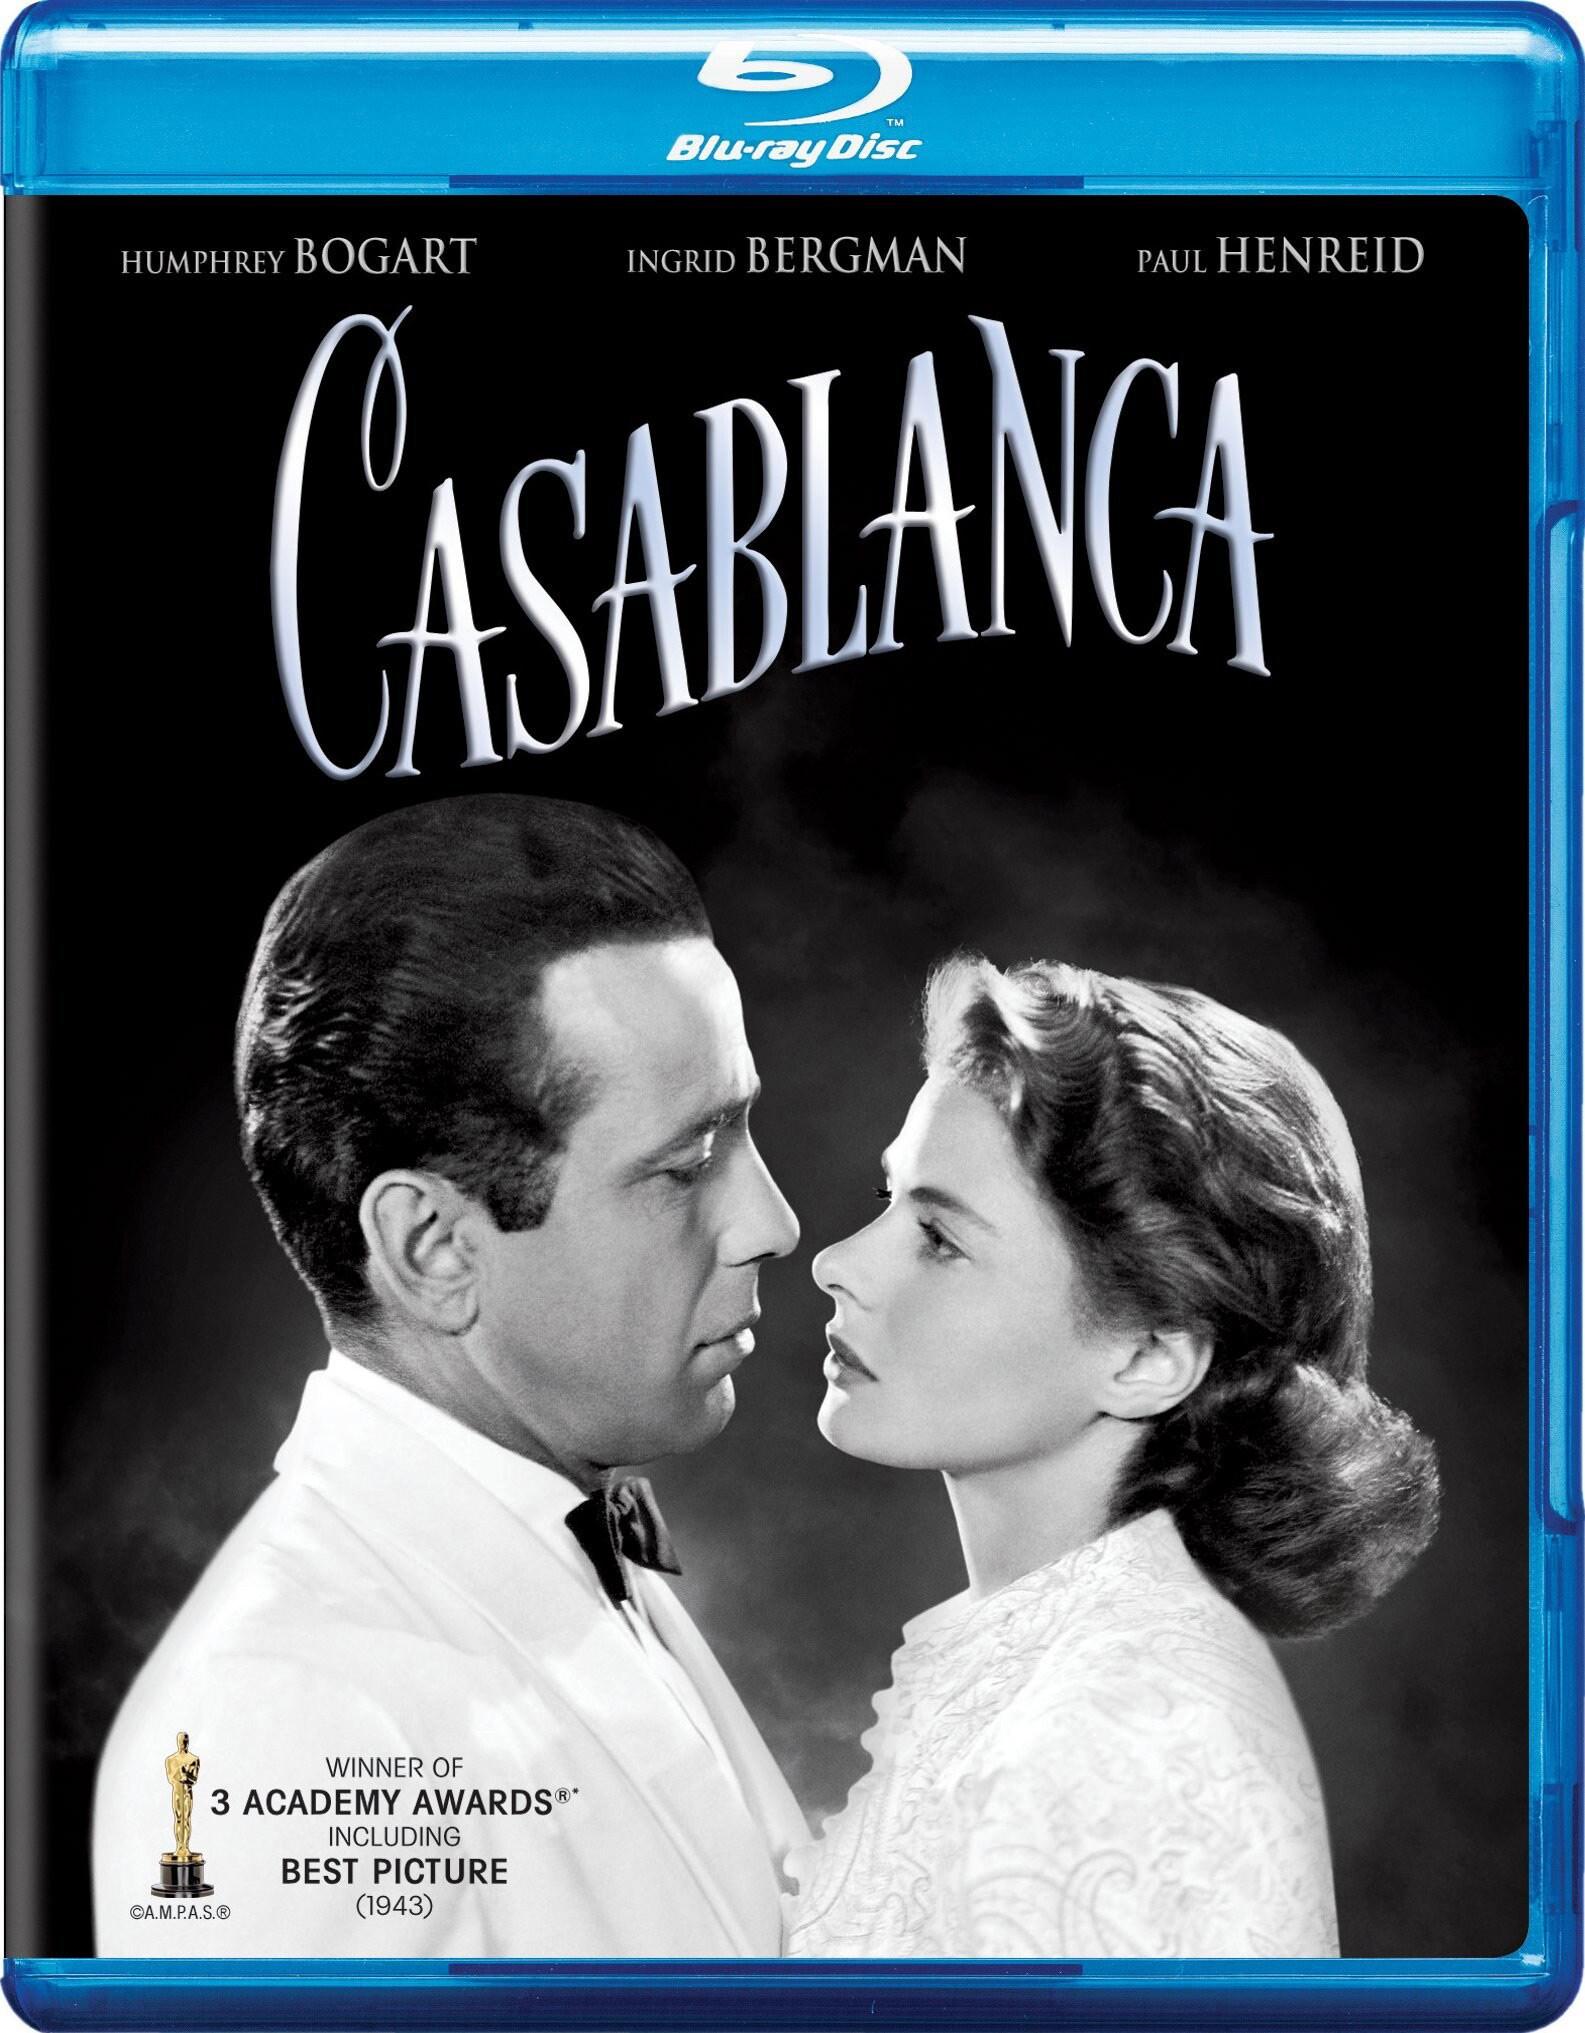 Casablanca: 70th Anniversary (Blu-ray Disc)